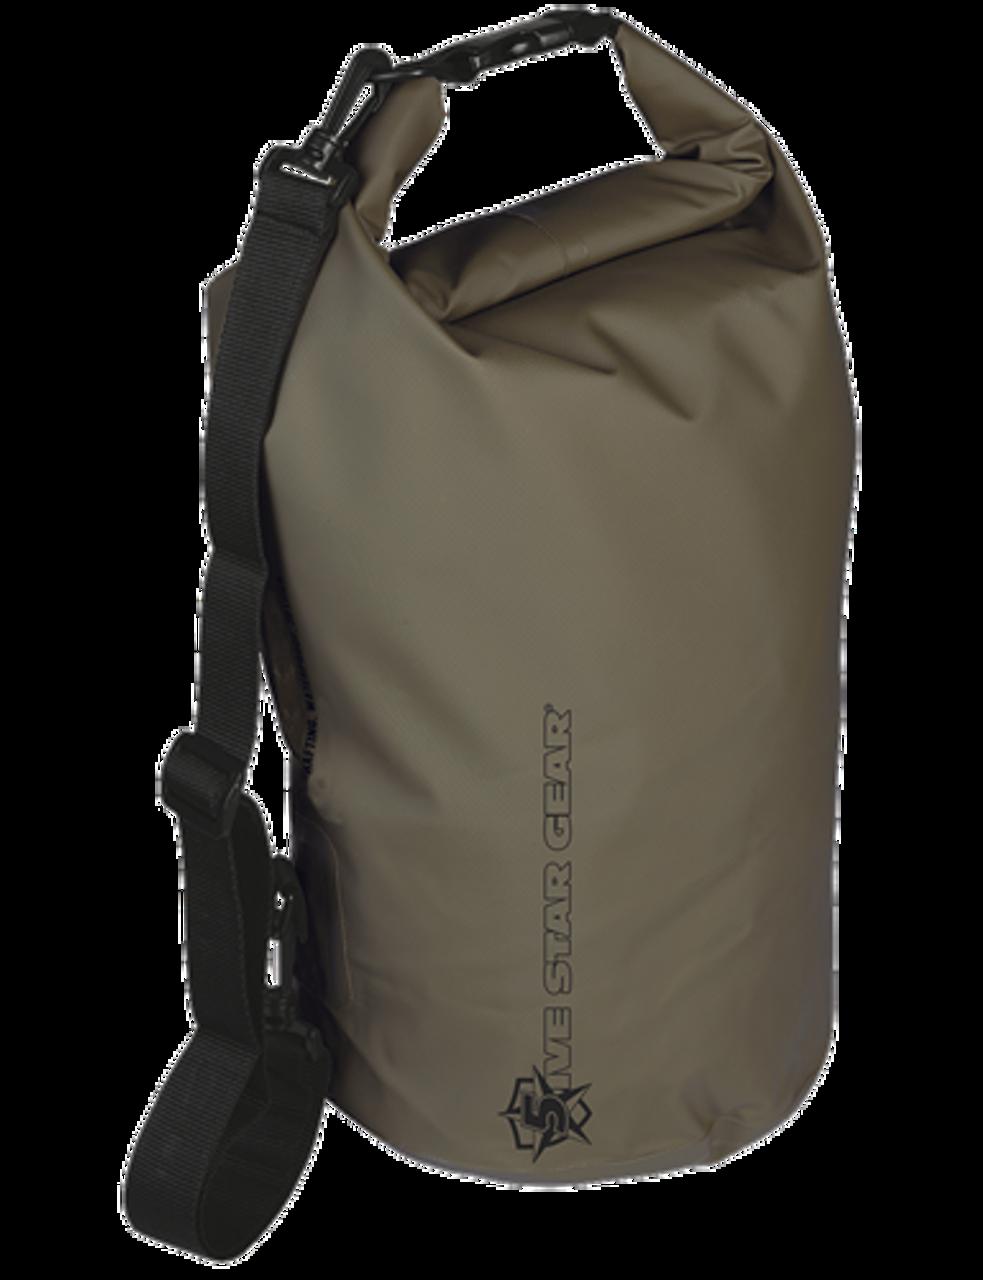 RIVER'S EDGE 30L WATERPROOF BAG from Hessen Tactical